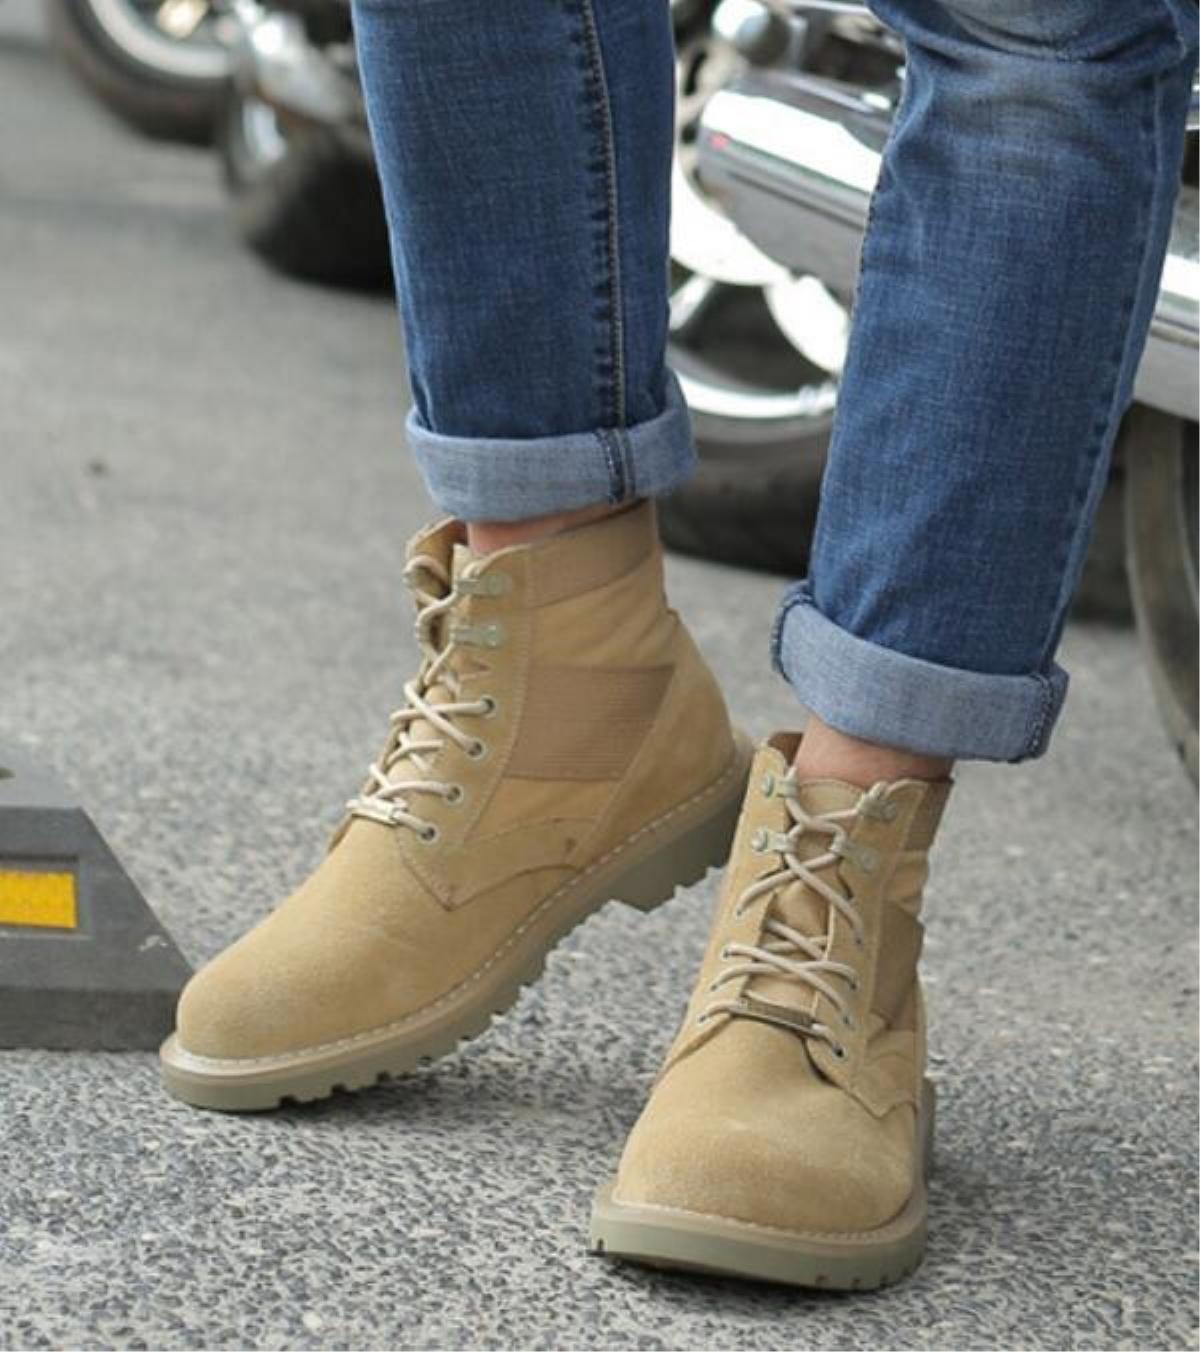 Neue Männer Leder Martin Stiefel Outdoor Anti-Rutsch Große Größen Schuhe Schuhe Schuhe 39-44 13784b